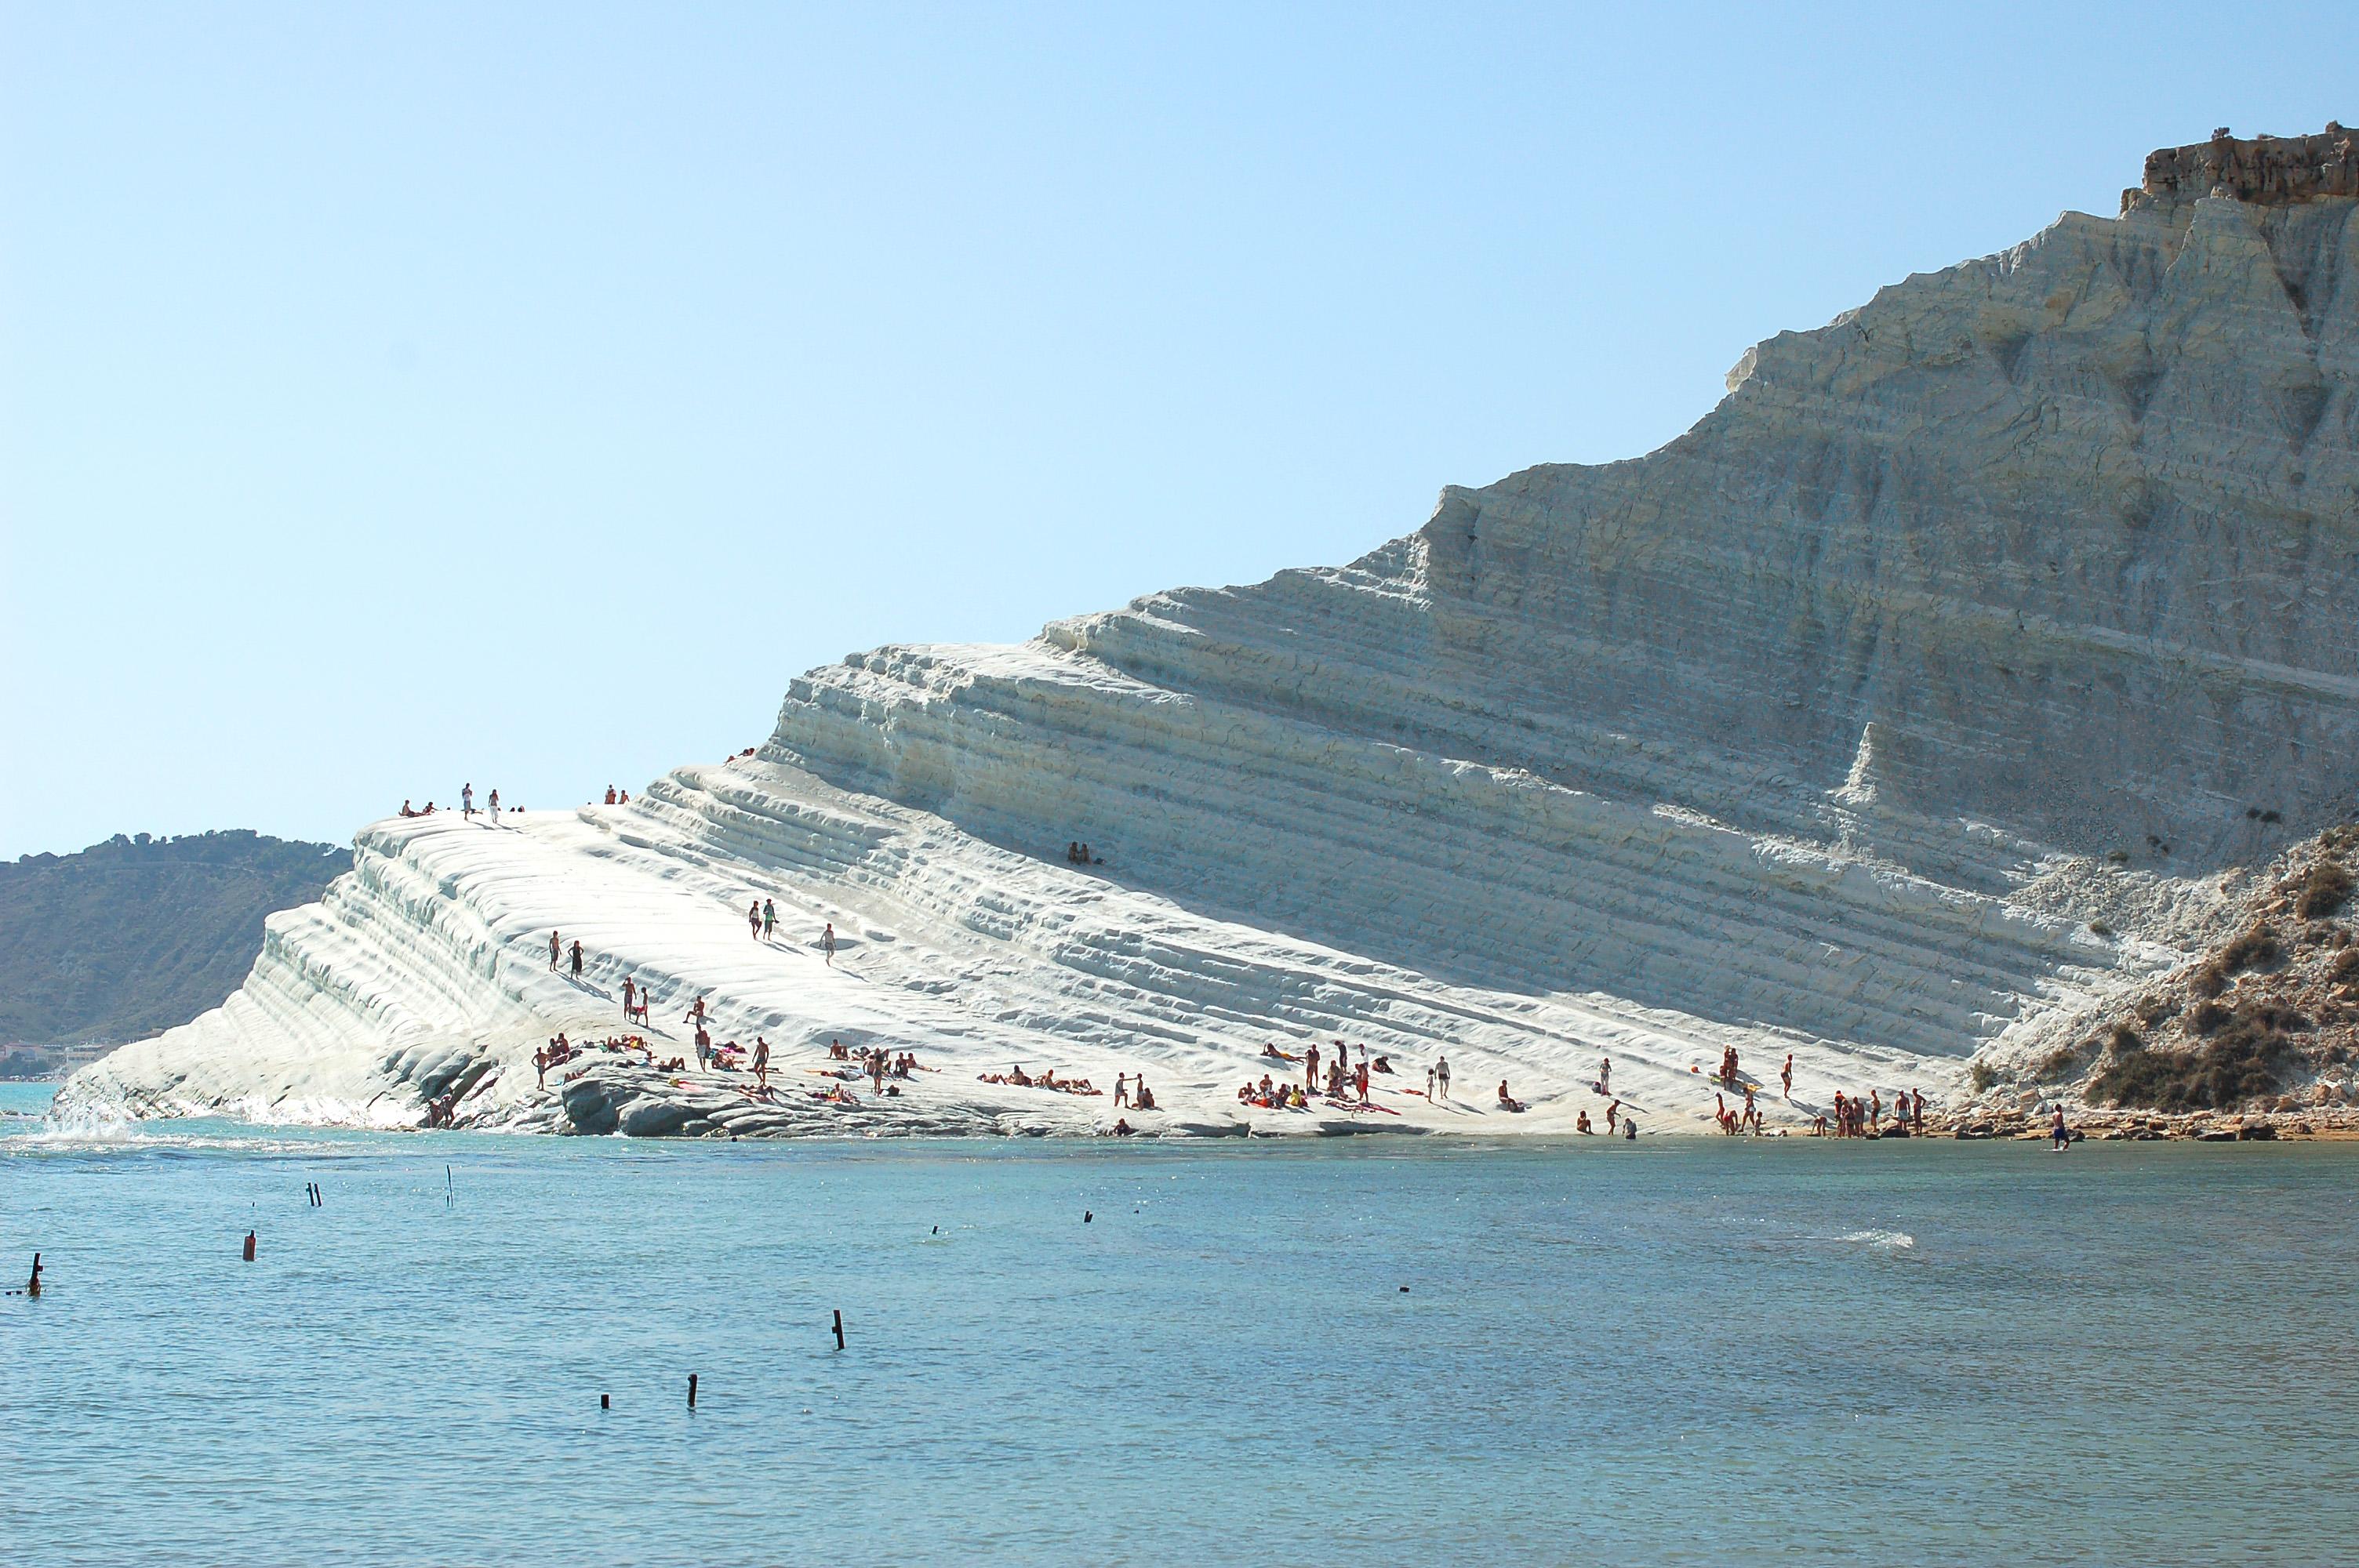 guia de viaje sicilia gratis